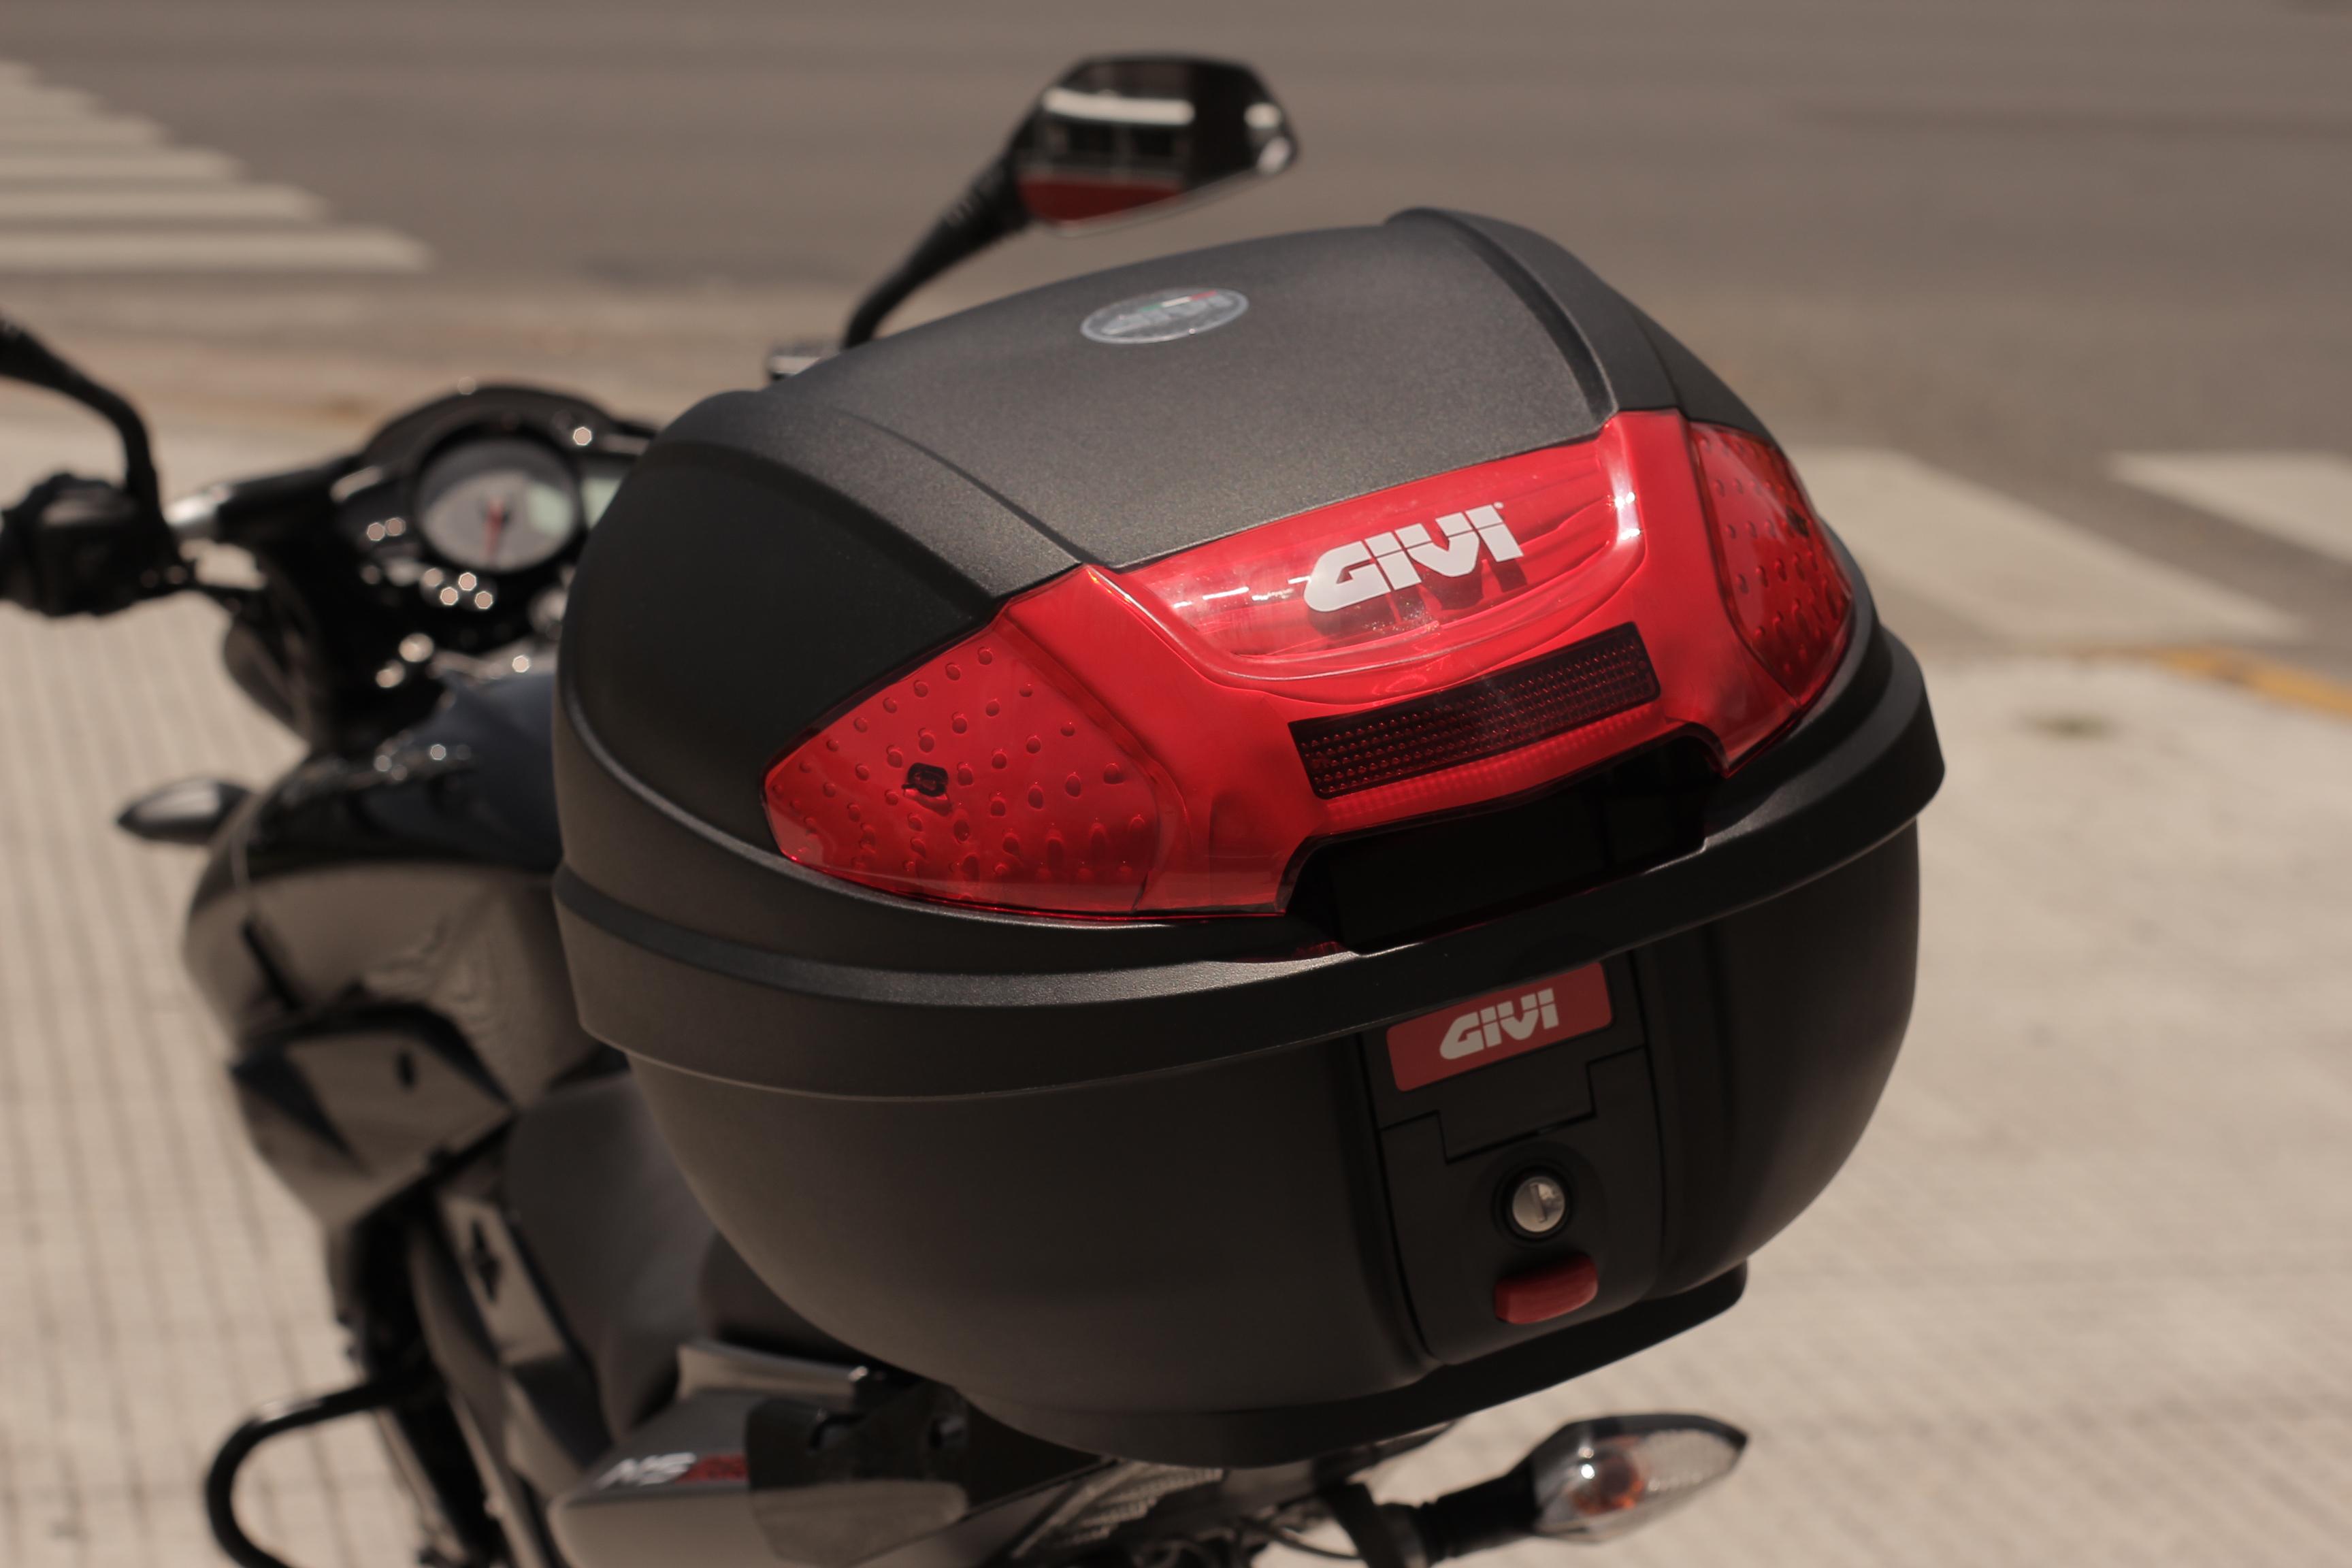 NS200 Givi Edition 1